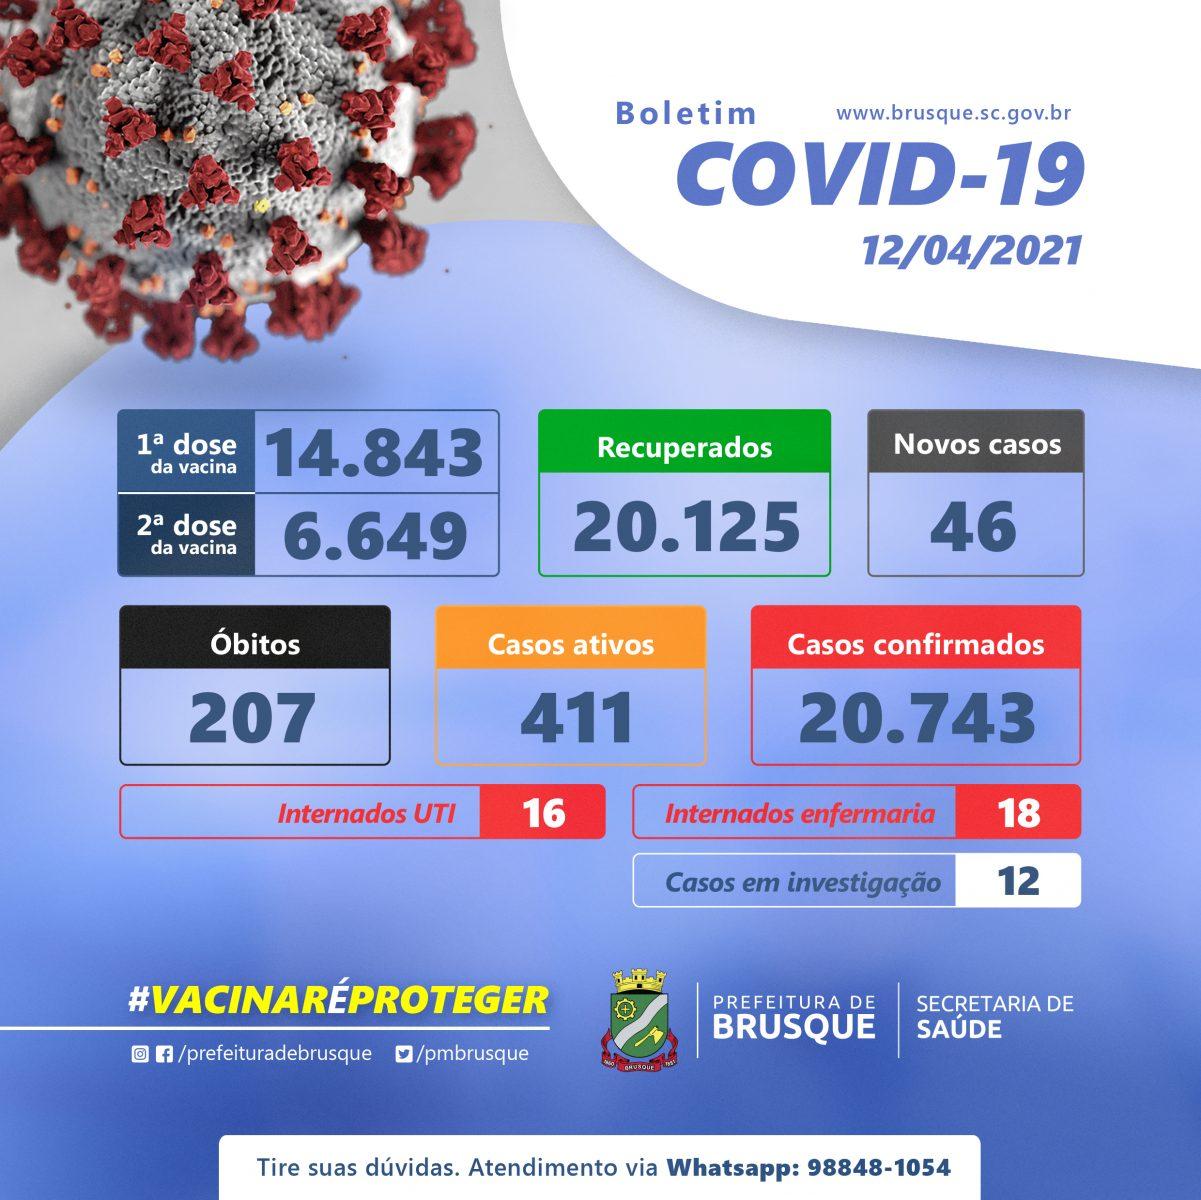 Covid 19: Confira o boletim epidemiológico desta segunda-feira (12)